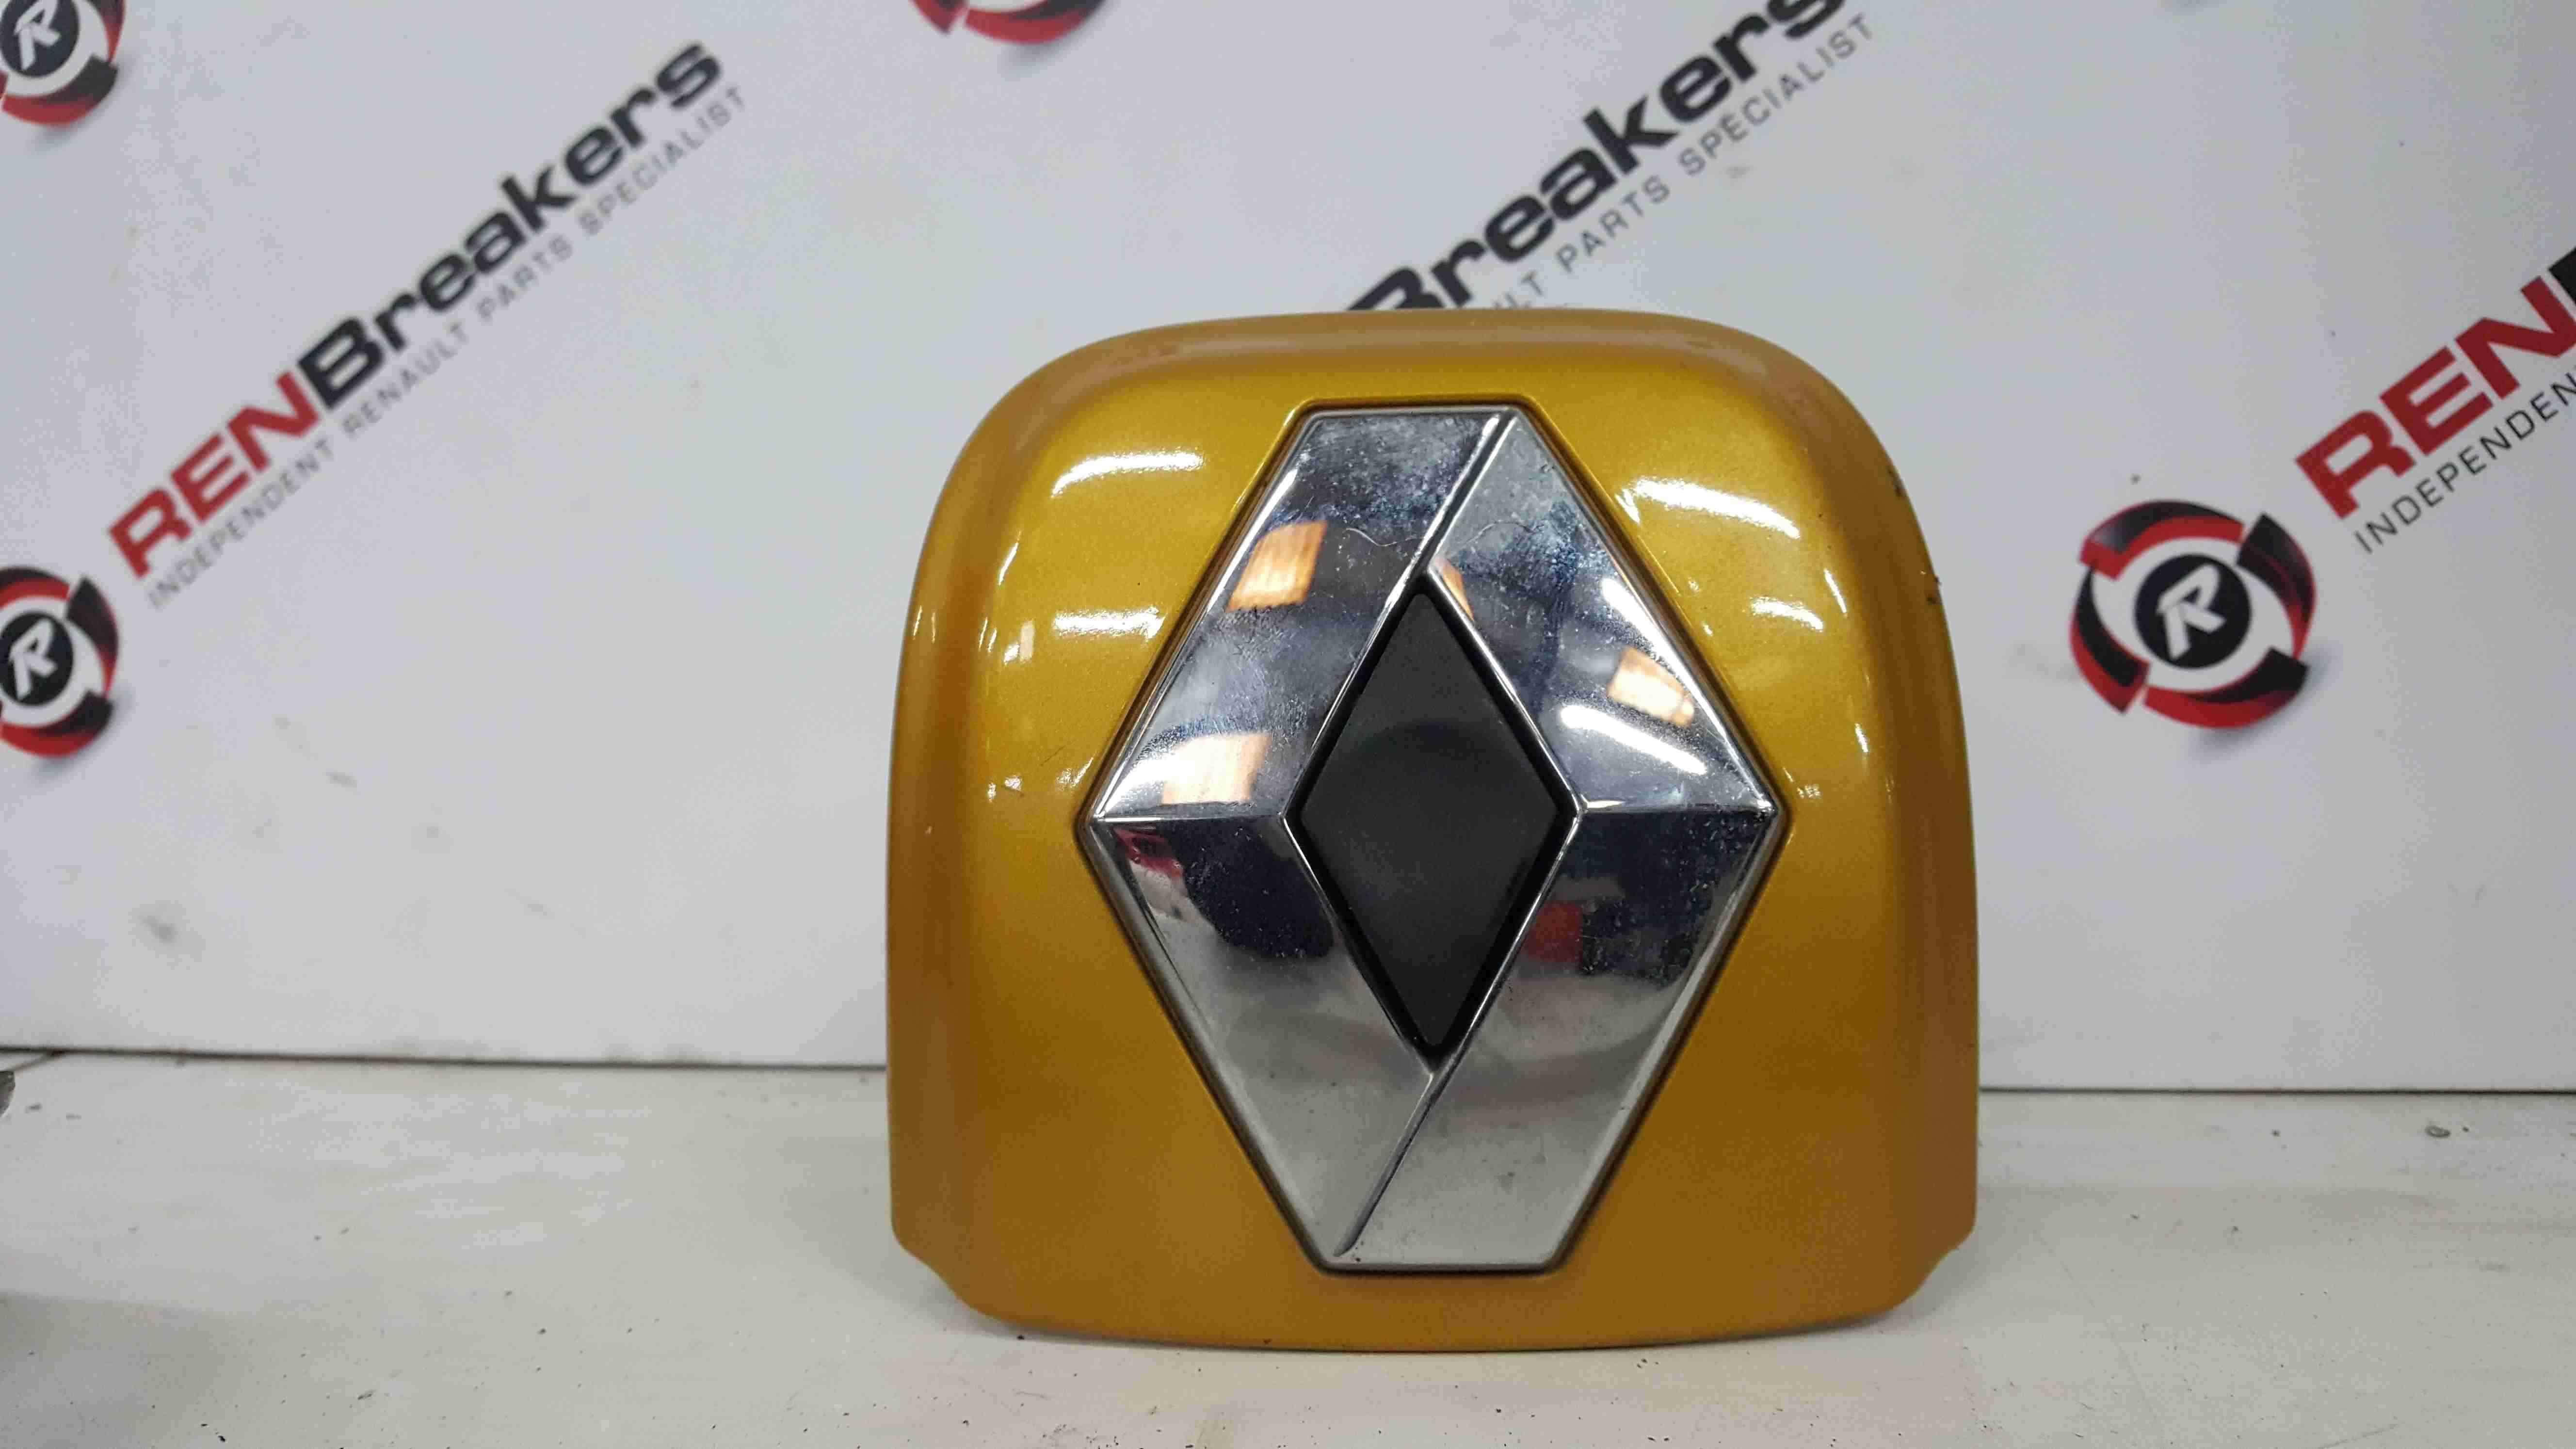 Renault Clio MK2 2001-2006 Boot Lock Mechanism Gold